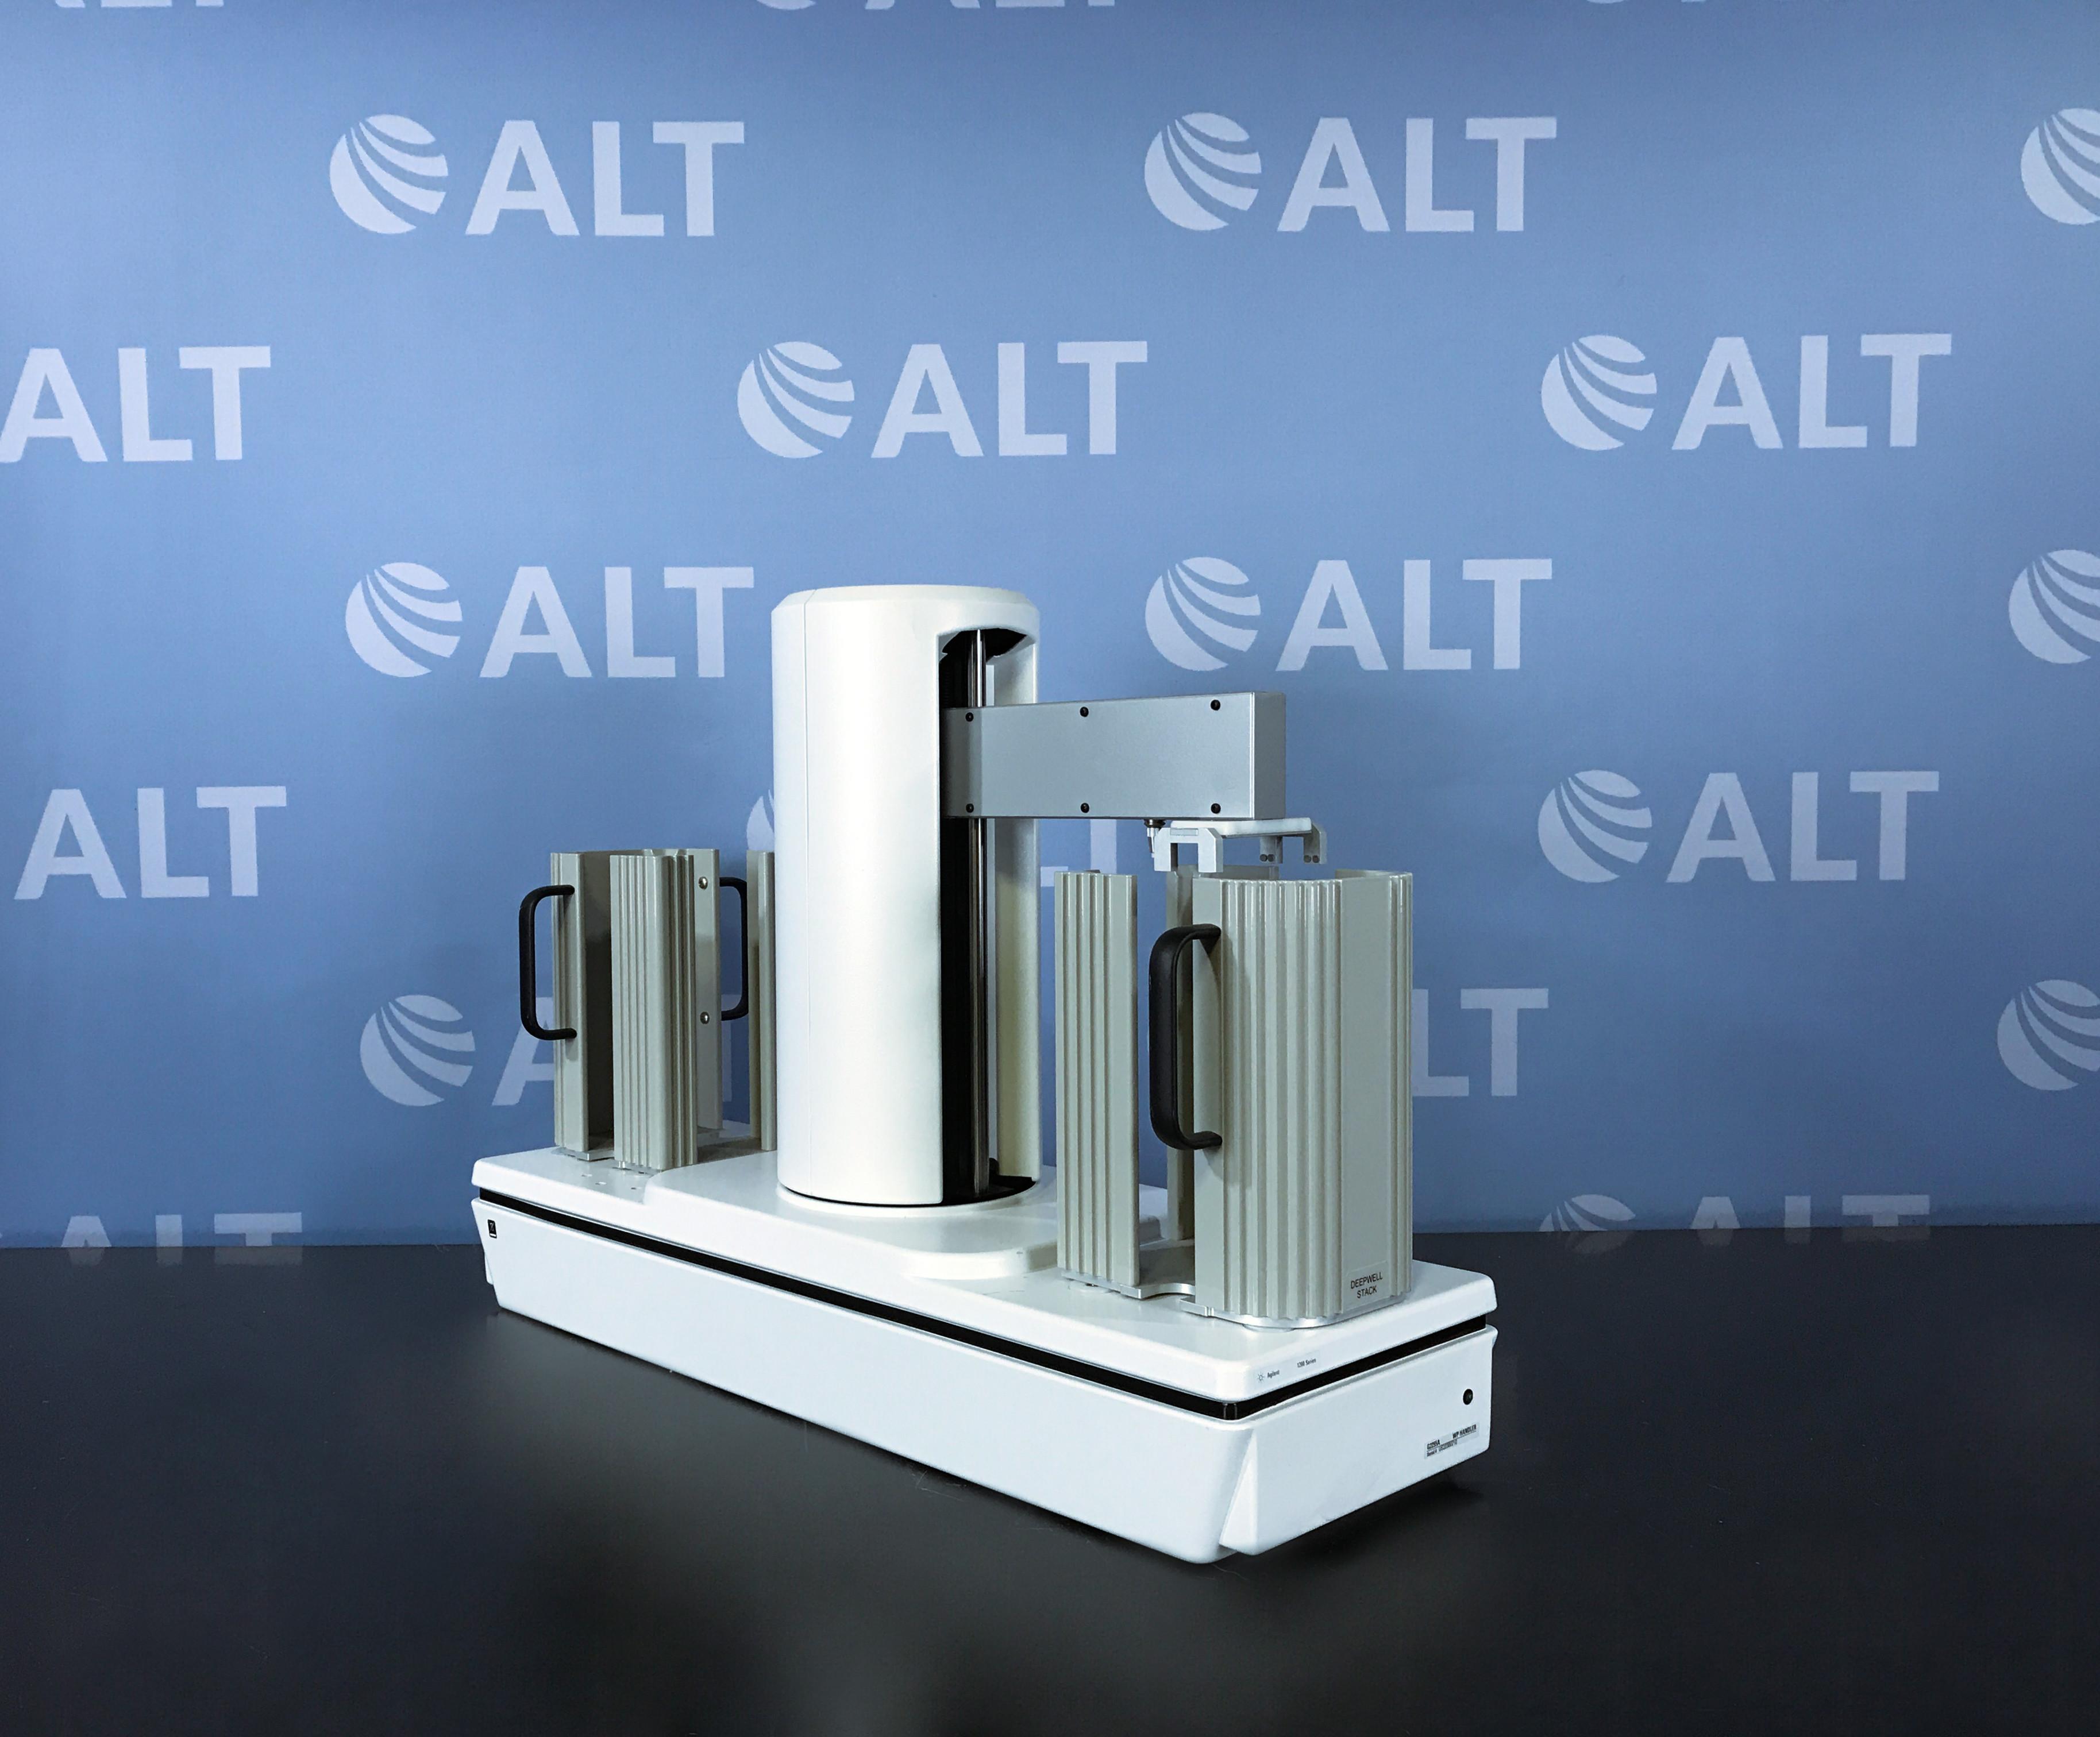 Agilent 1200 Series G2255A Well-plate Handler Image